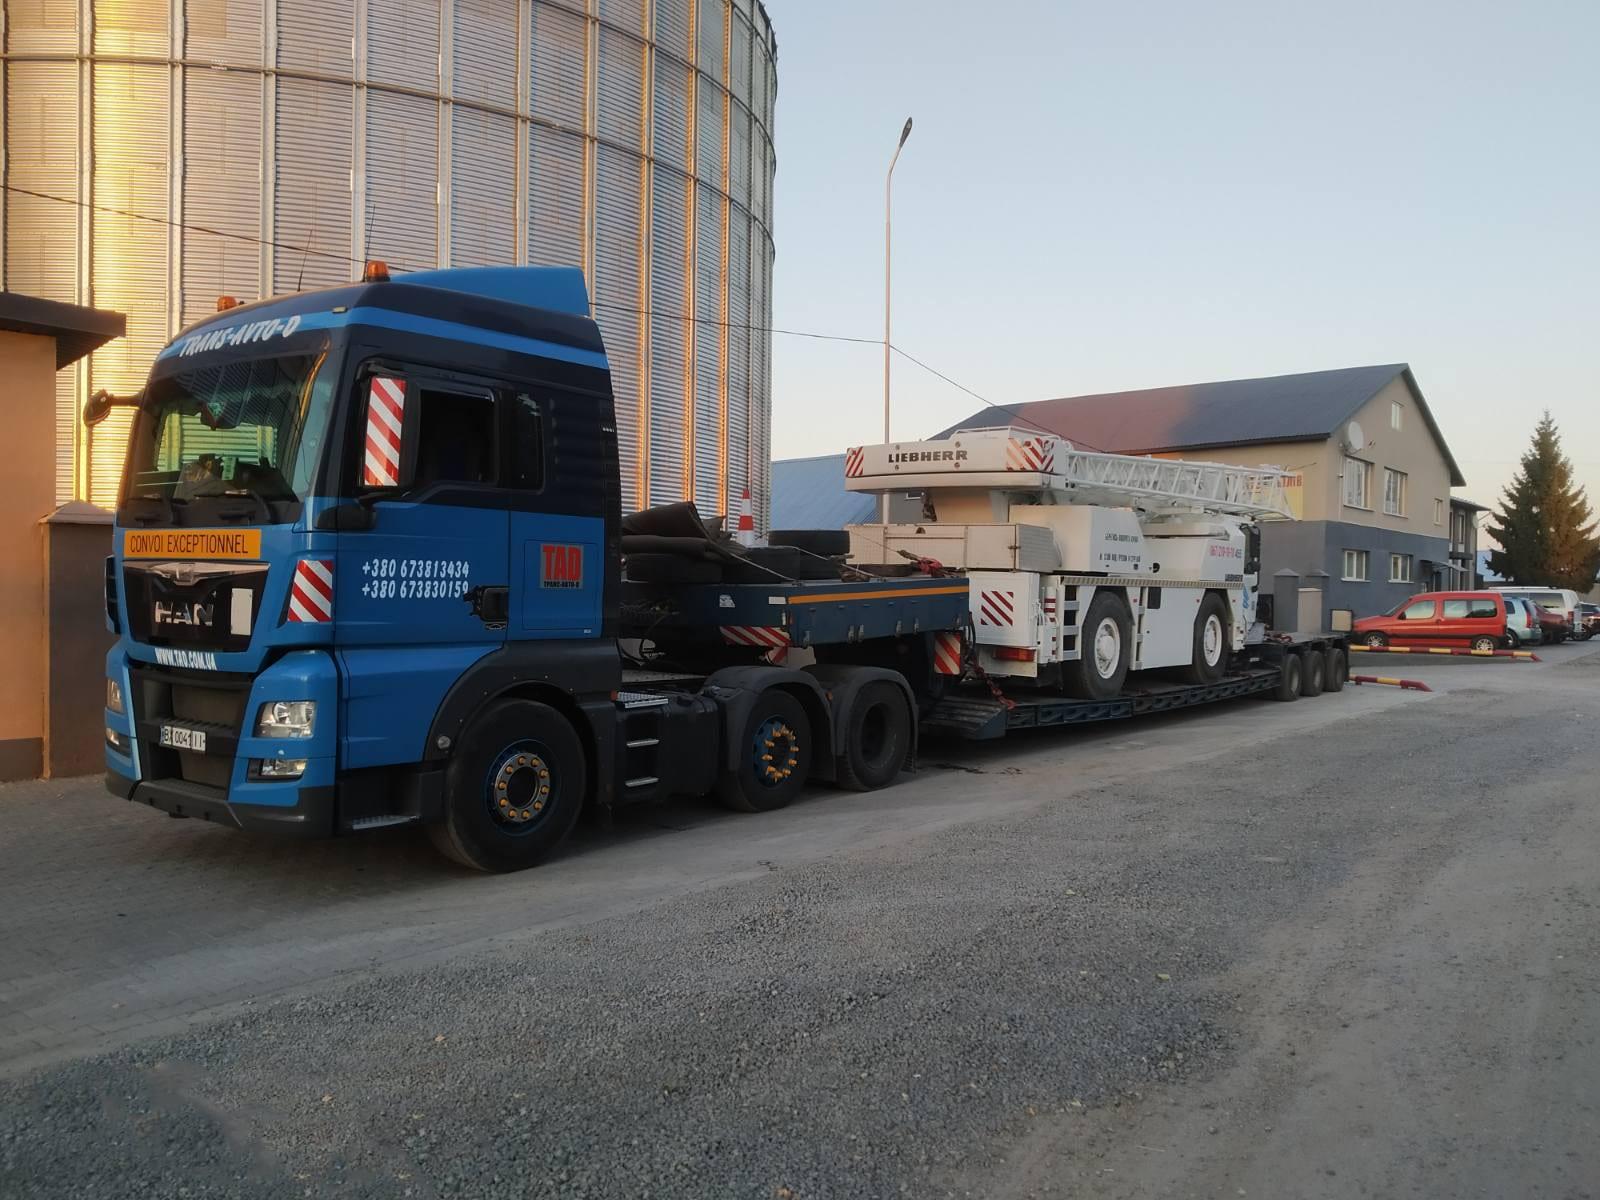 Transportation of the popular Liebherr LTM 1030 - 2 mobile crane - 2